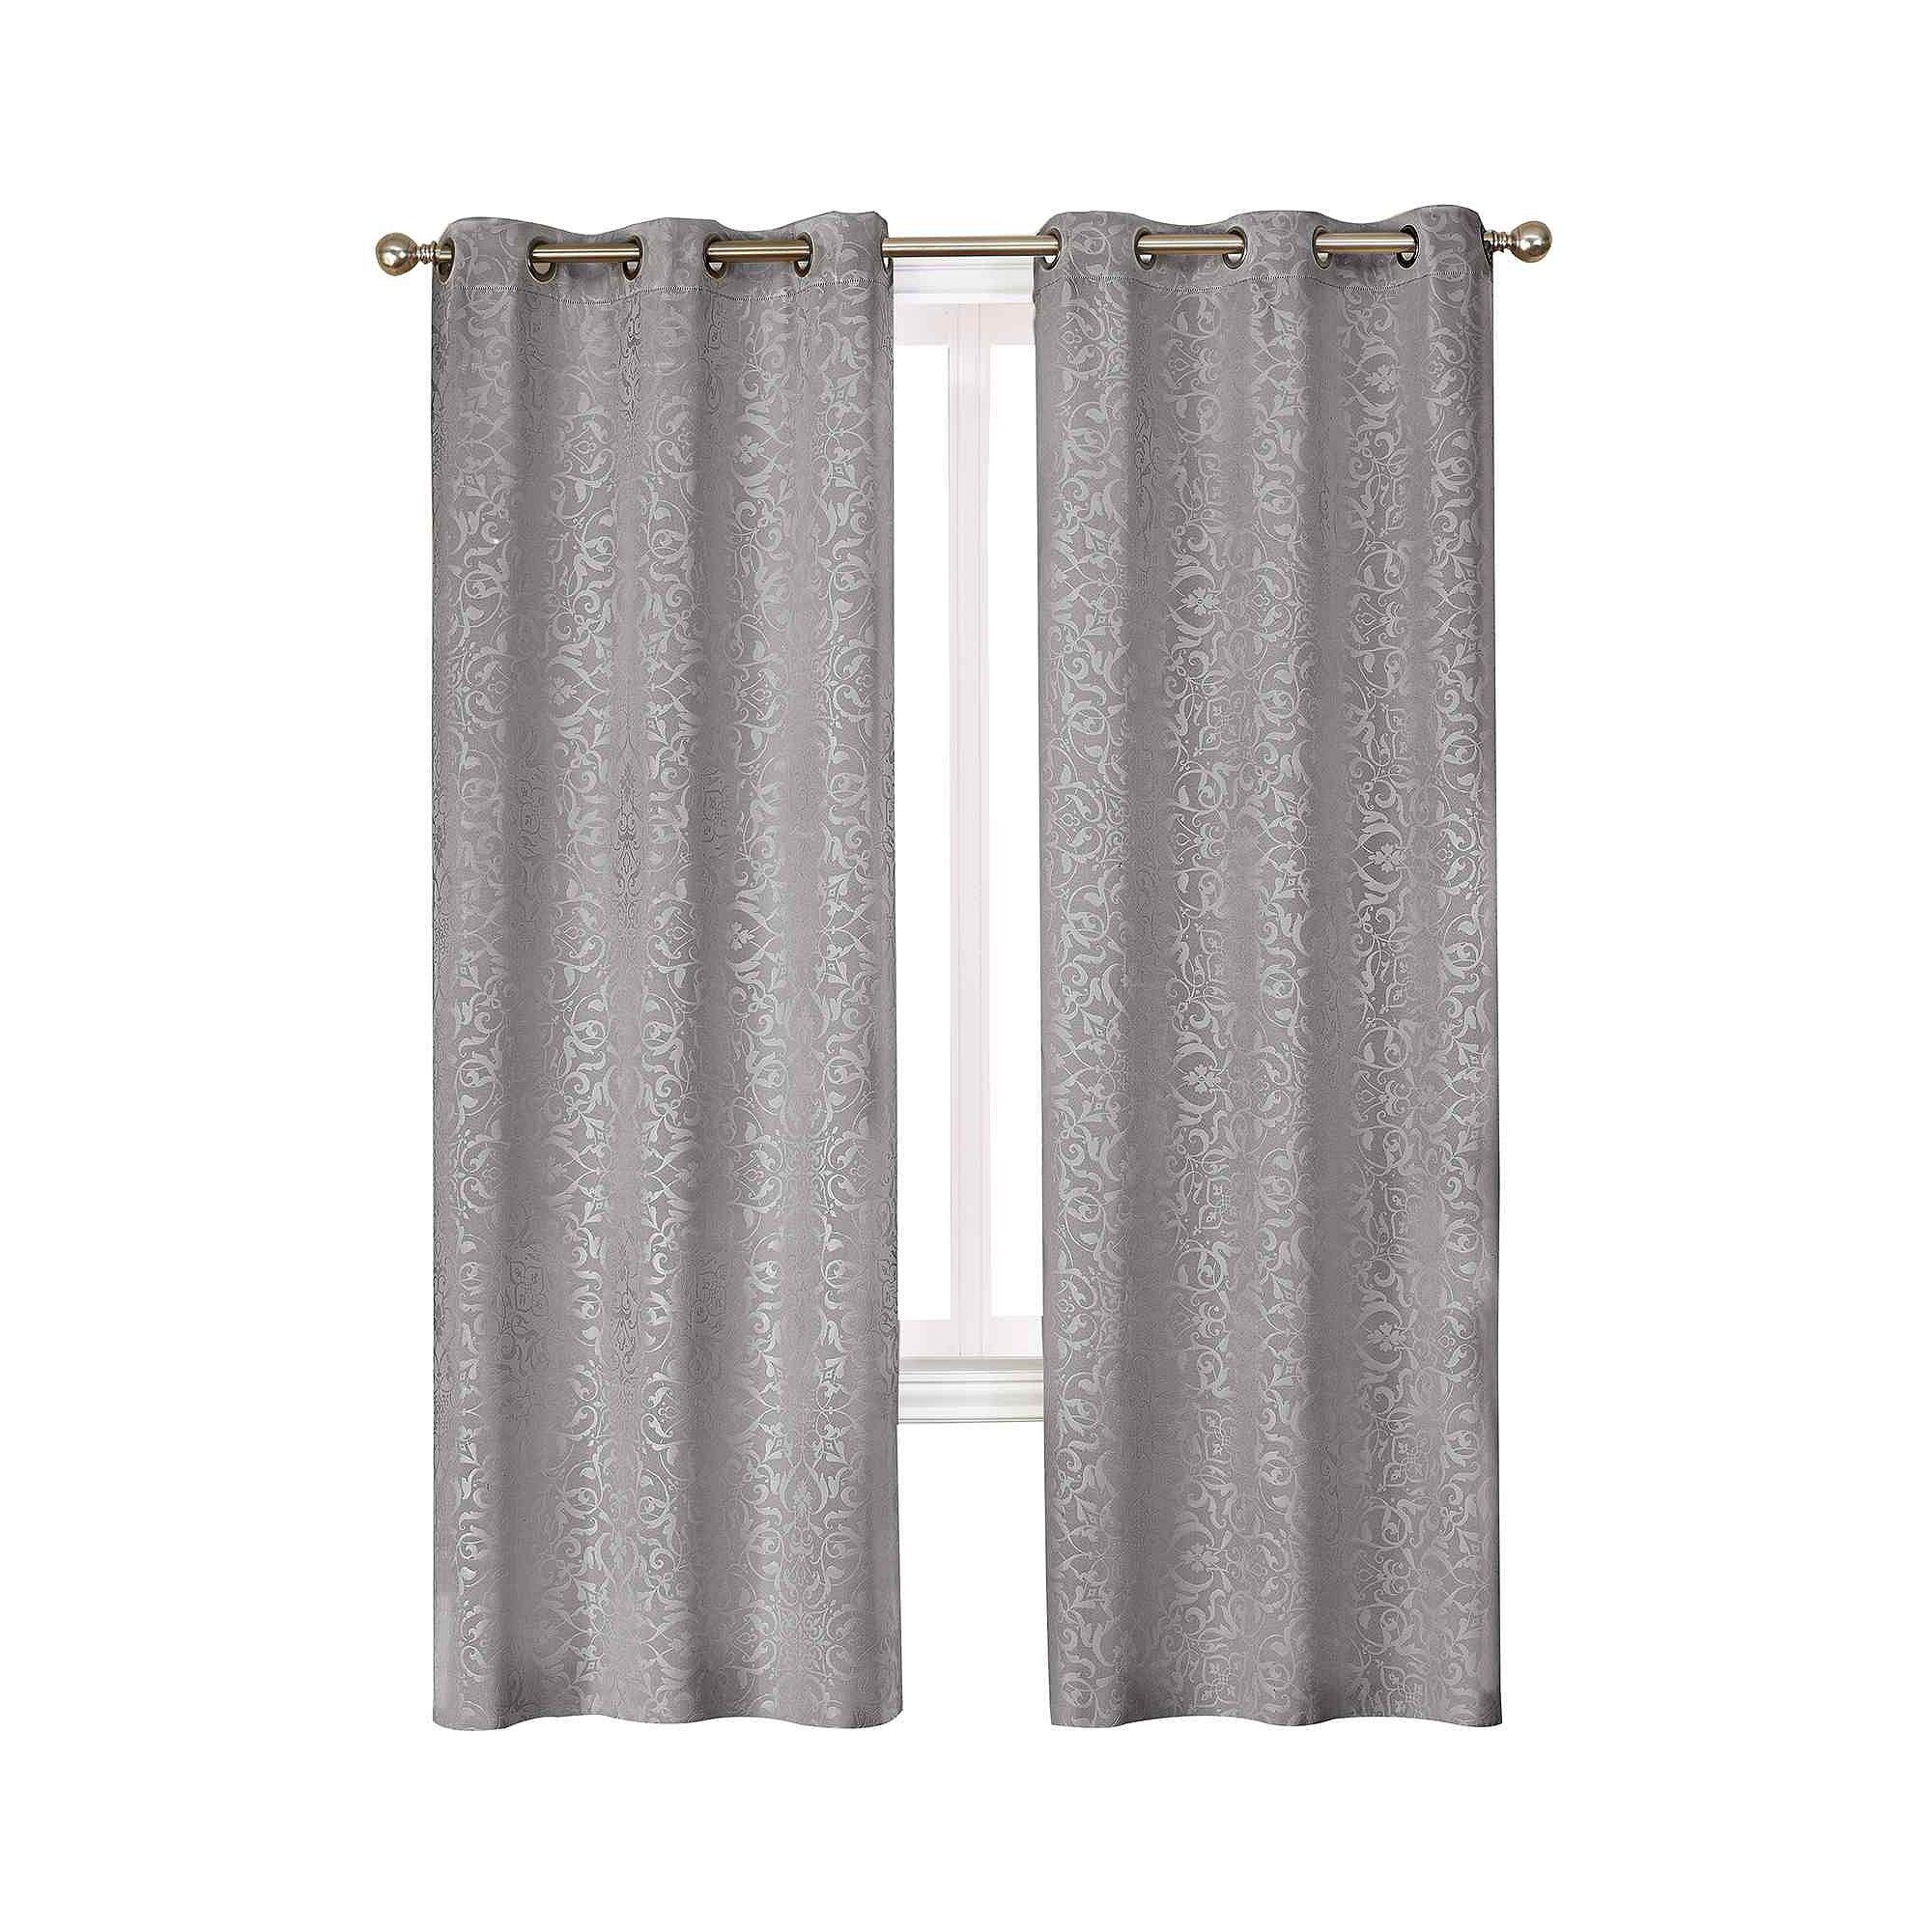 Medallion Blackout Grommet Top Curtain Panel Pair Curtain Menzilperde Net